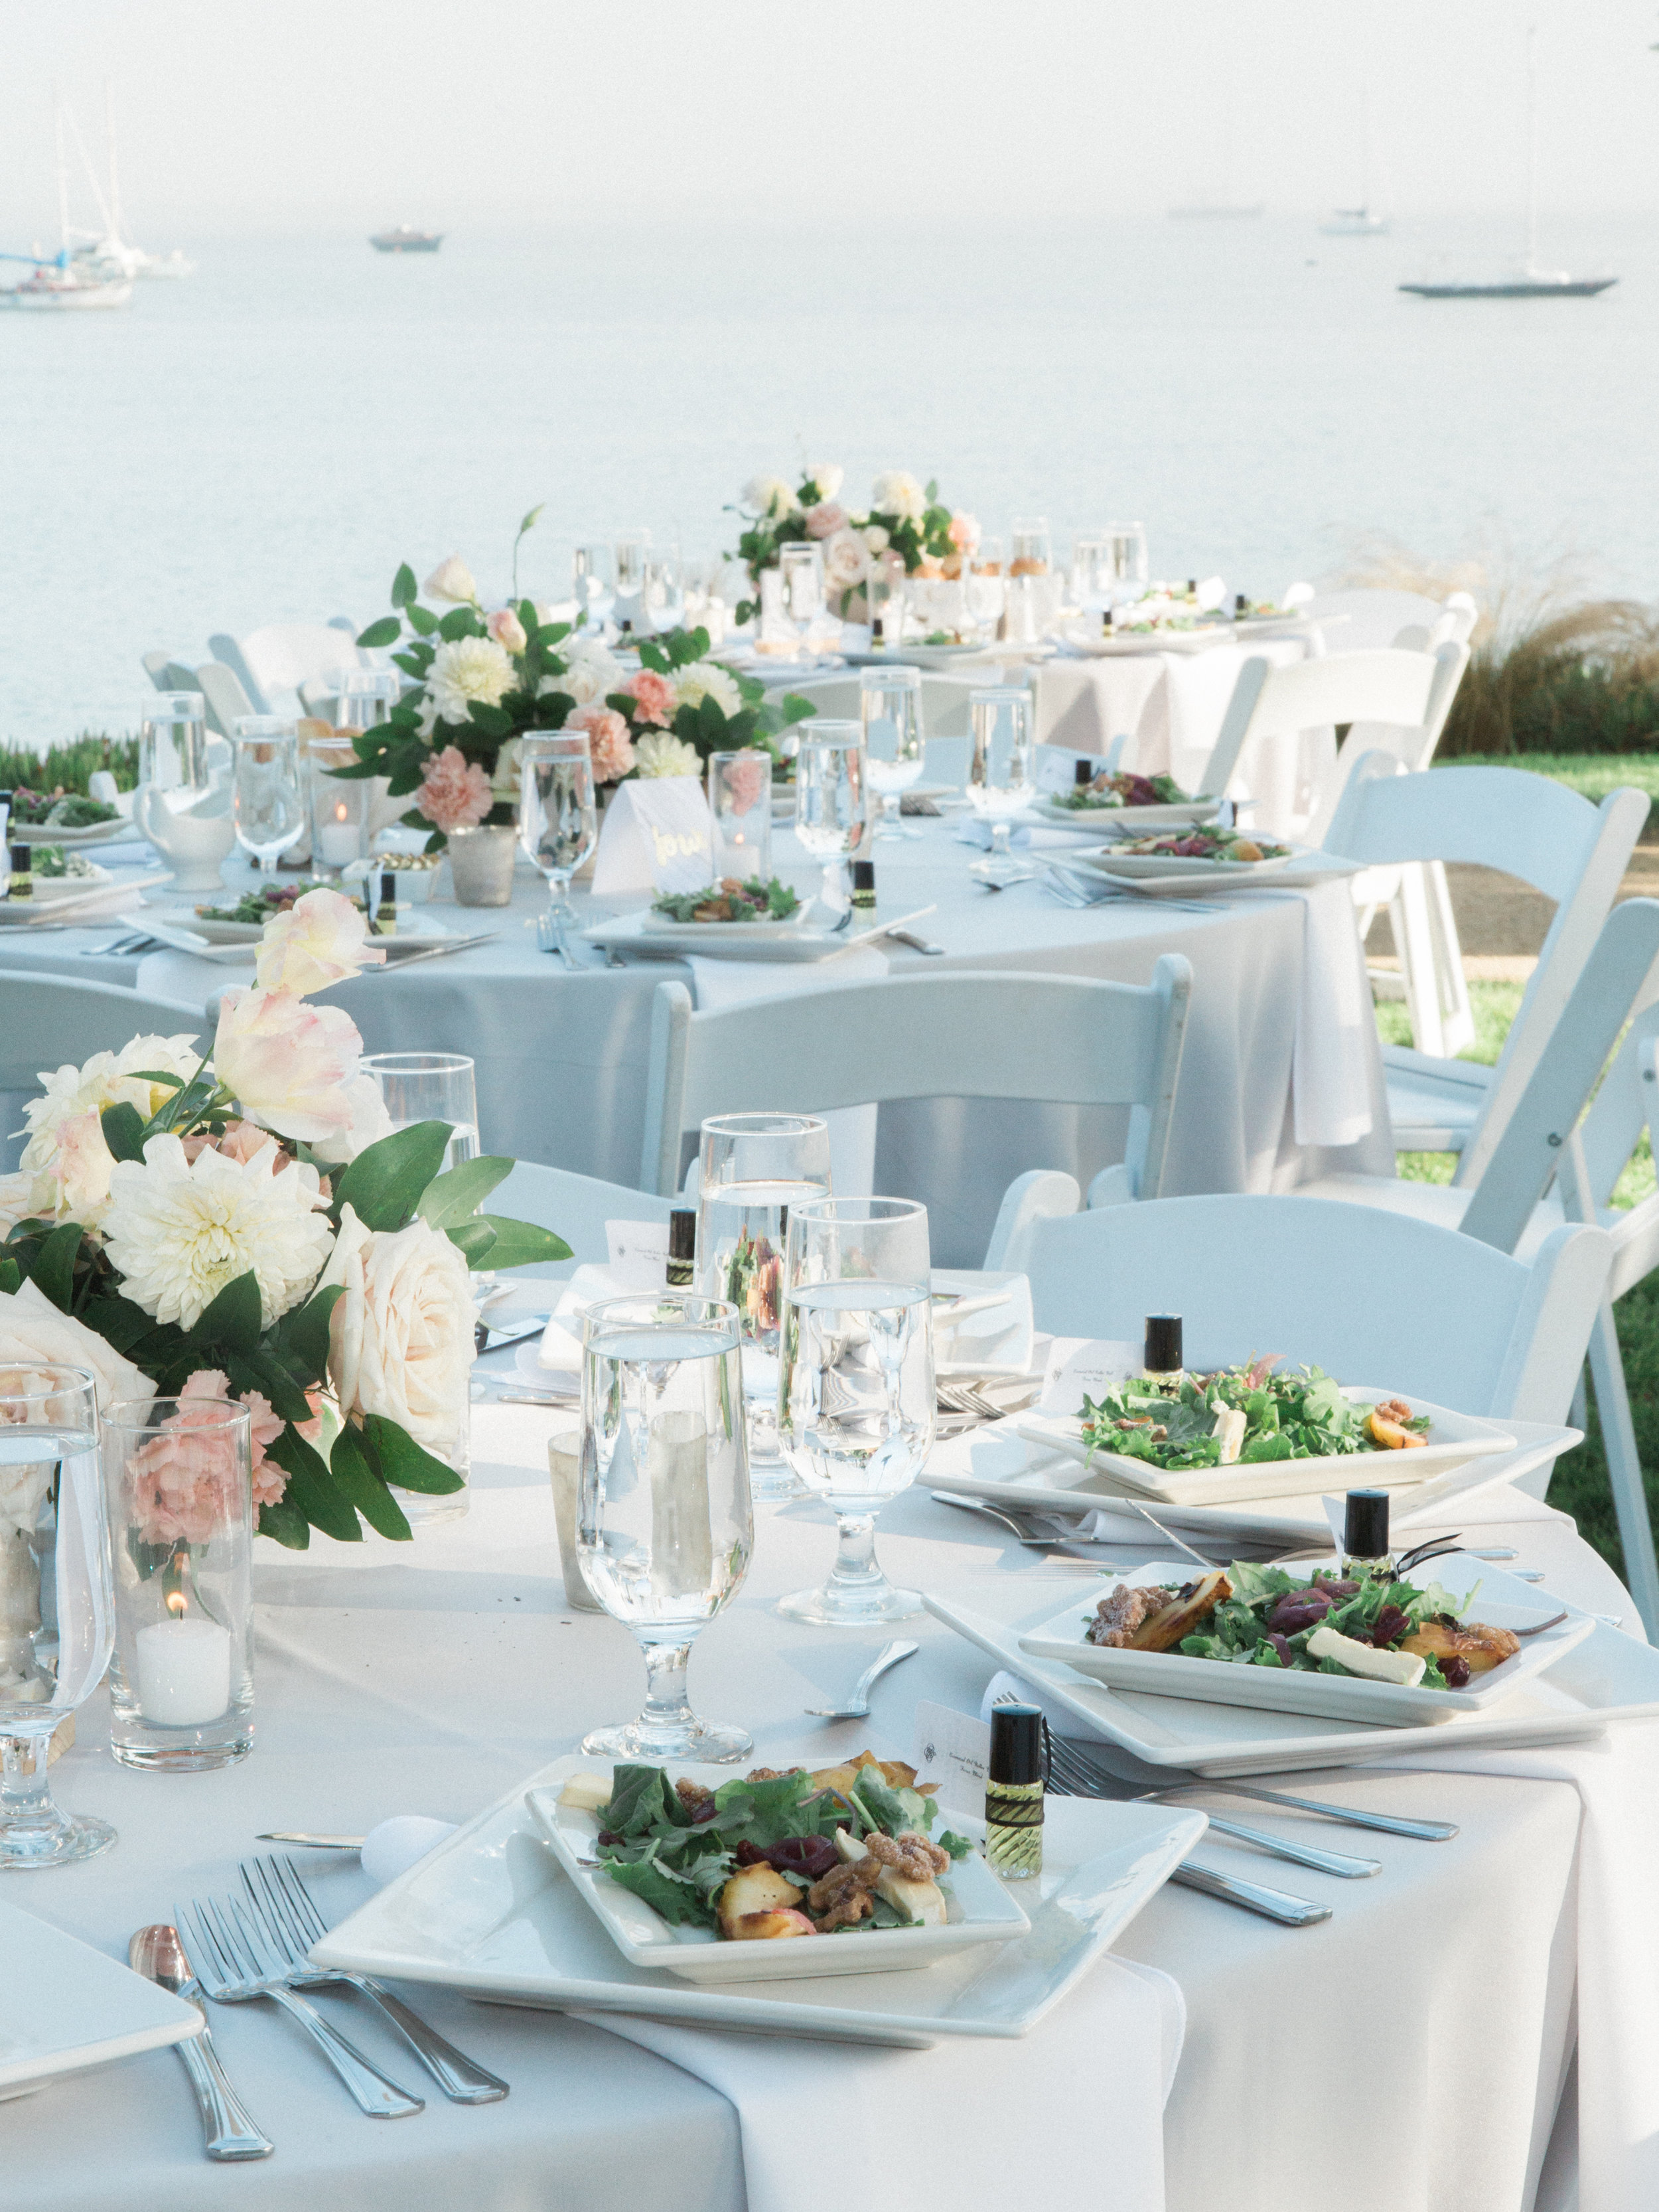 trynhphoto_socal_sf_halfmoon_bay_wedding_photographer_JA-464.jpg